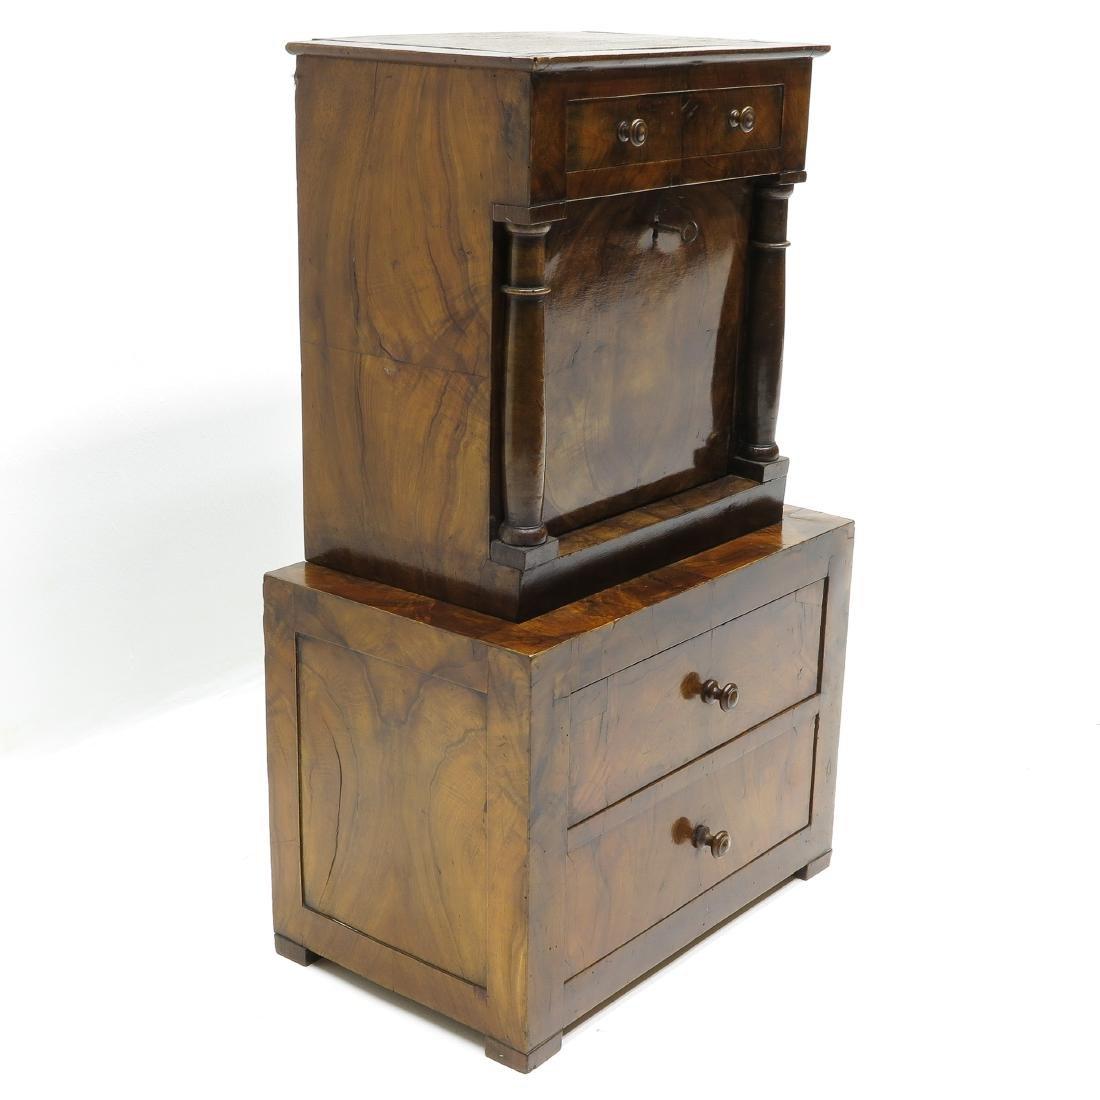 A 19th Century Miniature Walnut Cabinet - 3